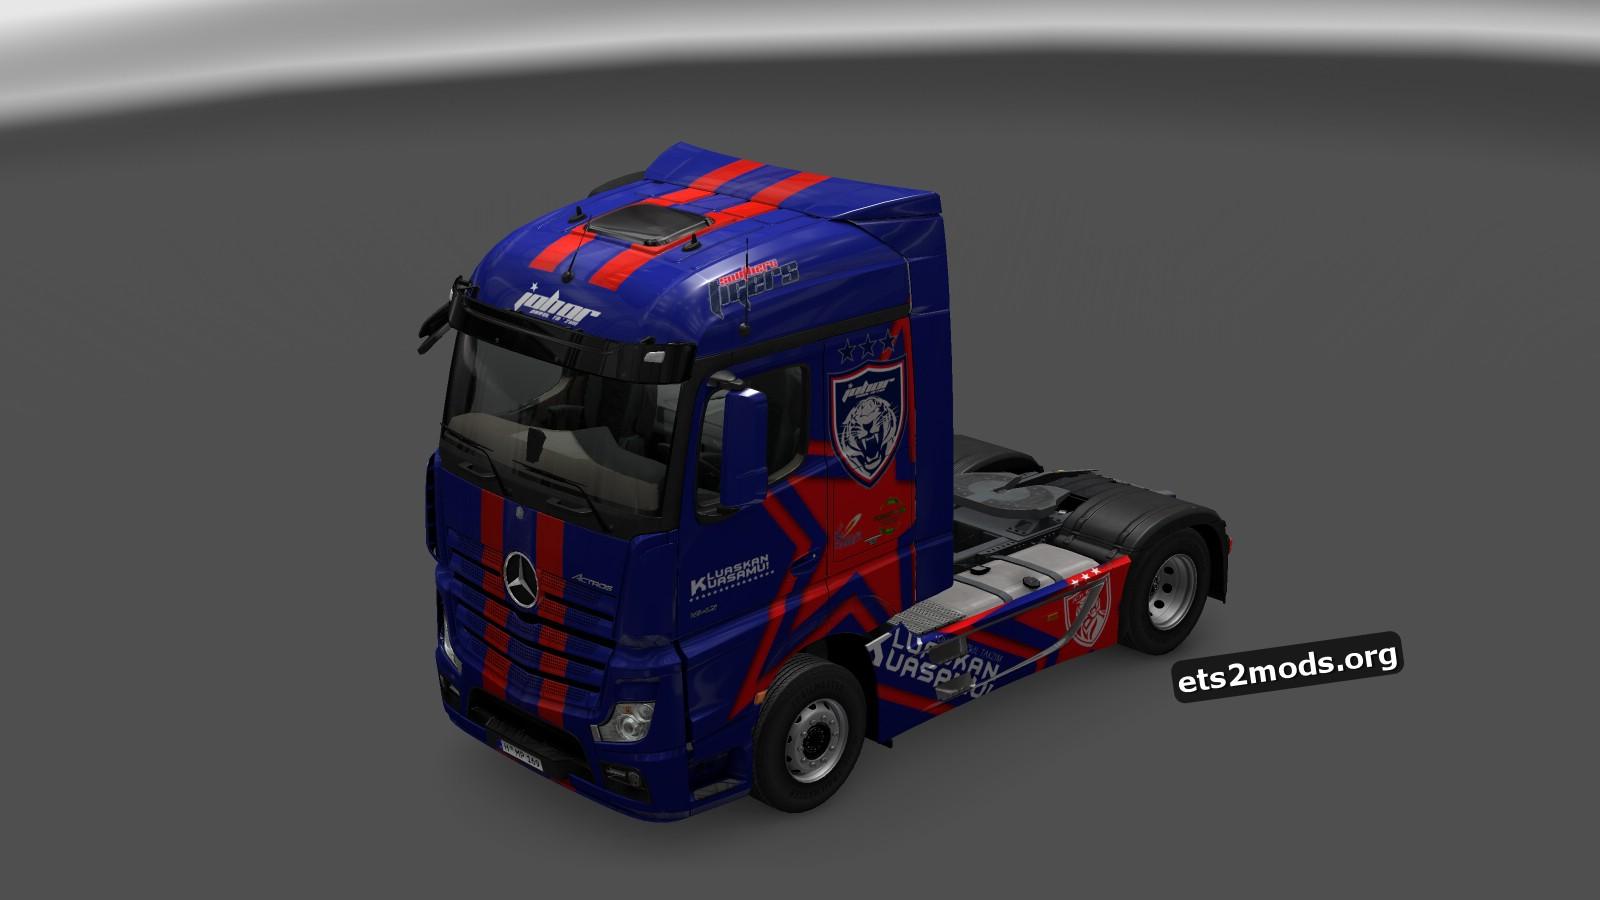 Johor Darul Takzim FC/ JDT Skin for Mercedes MP4